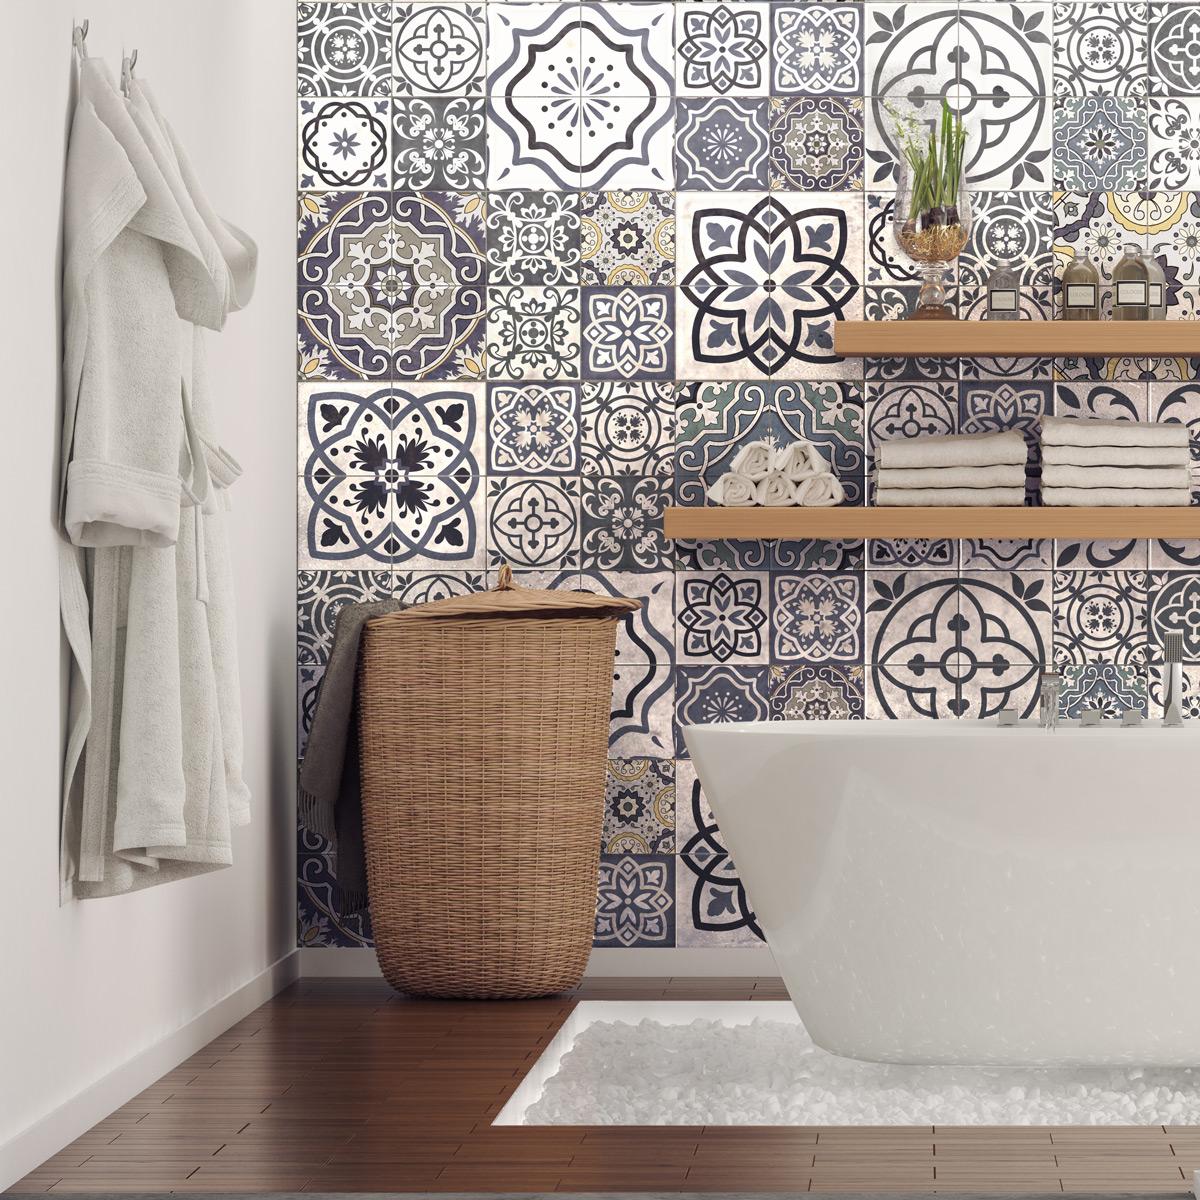 Salle De Bain Azulejos ~ 60 stickers carrelages azulejos milonga salle de bain et wc salle